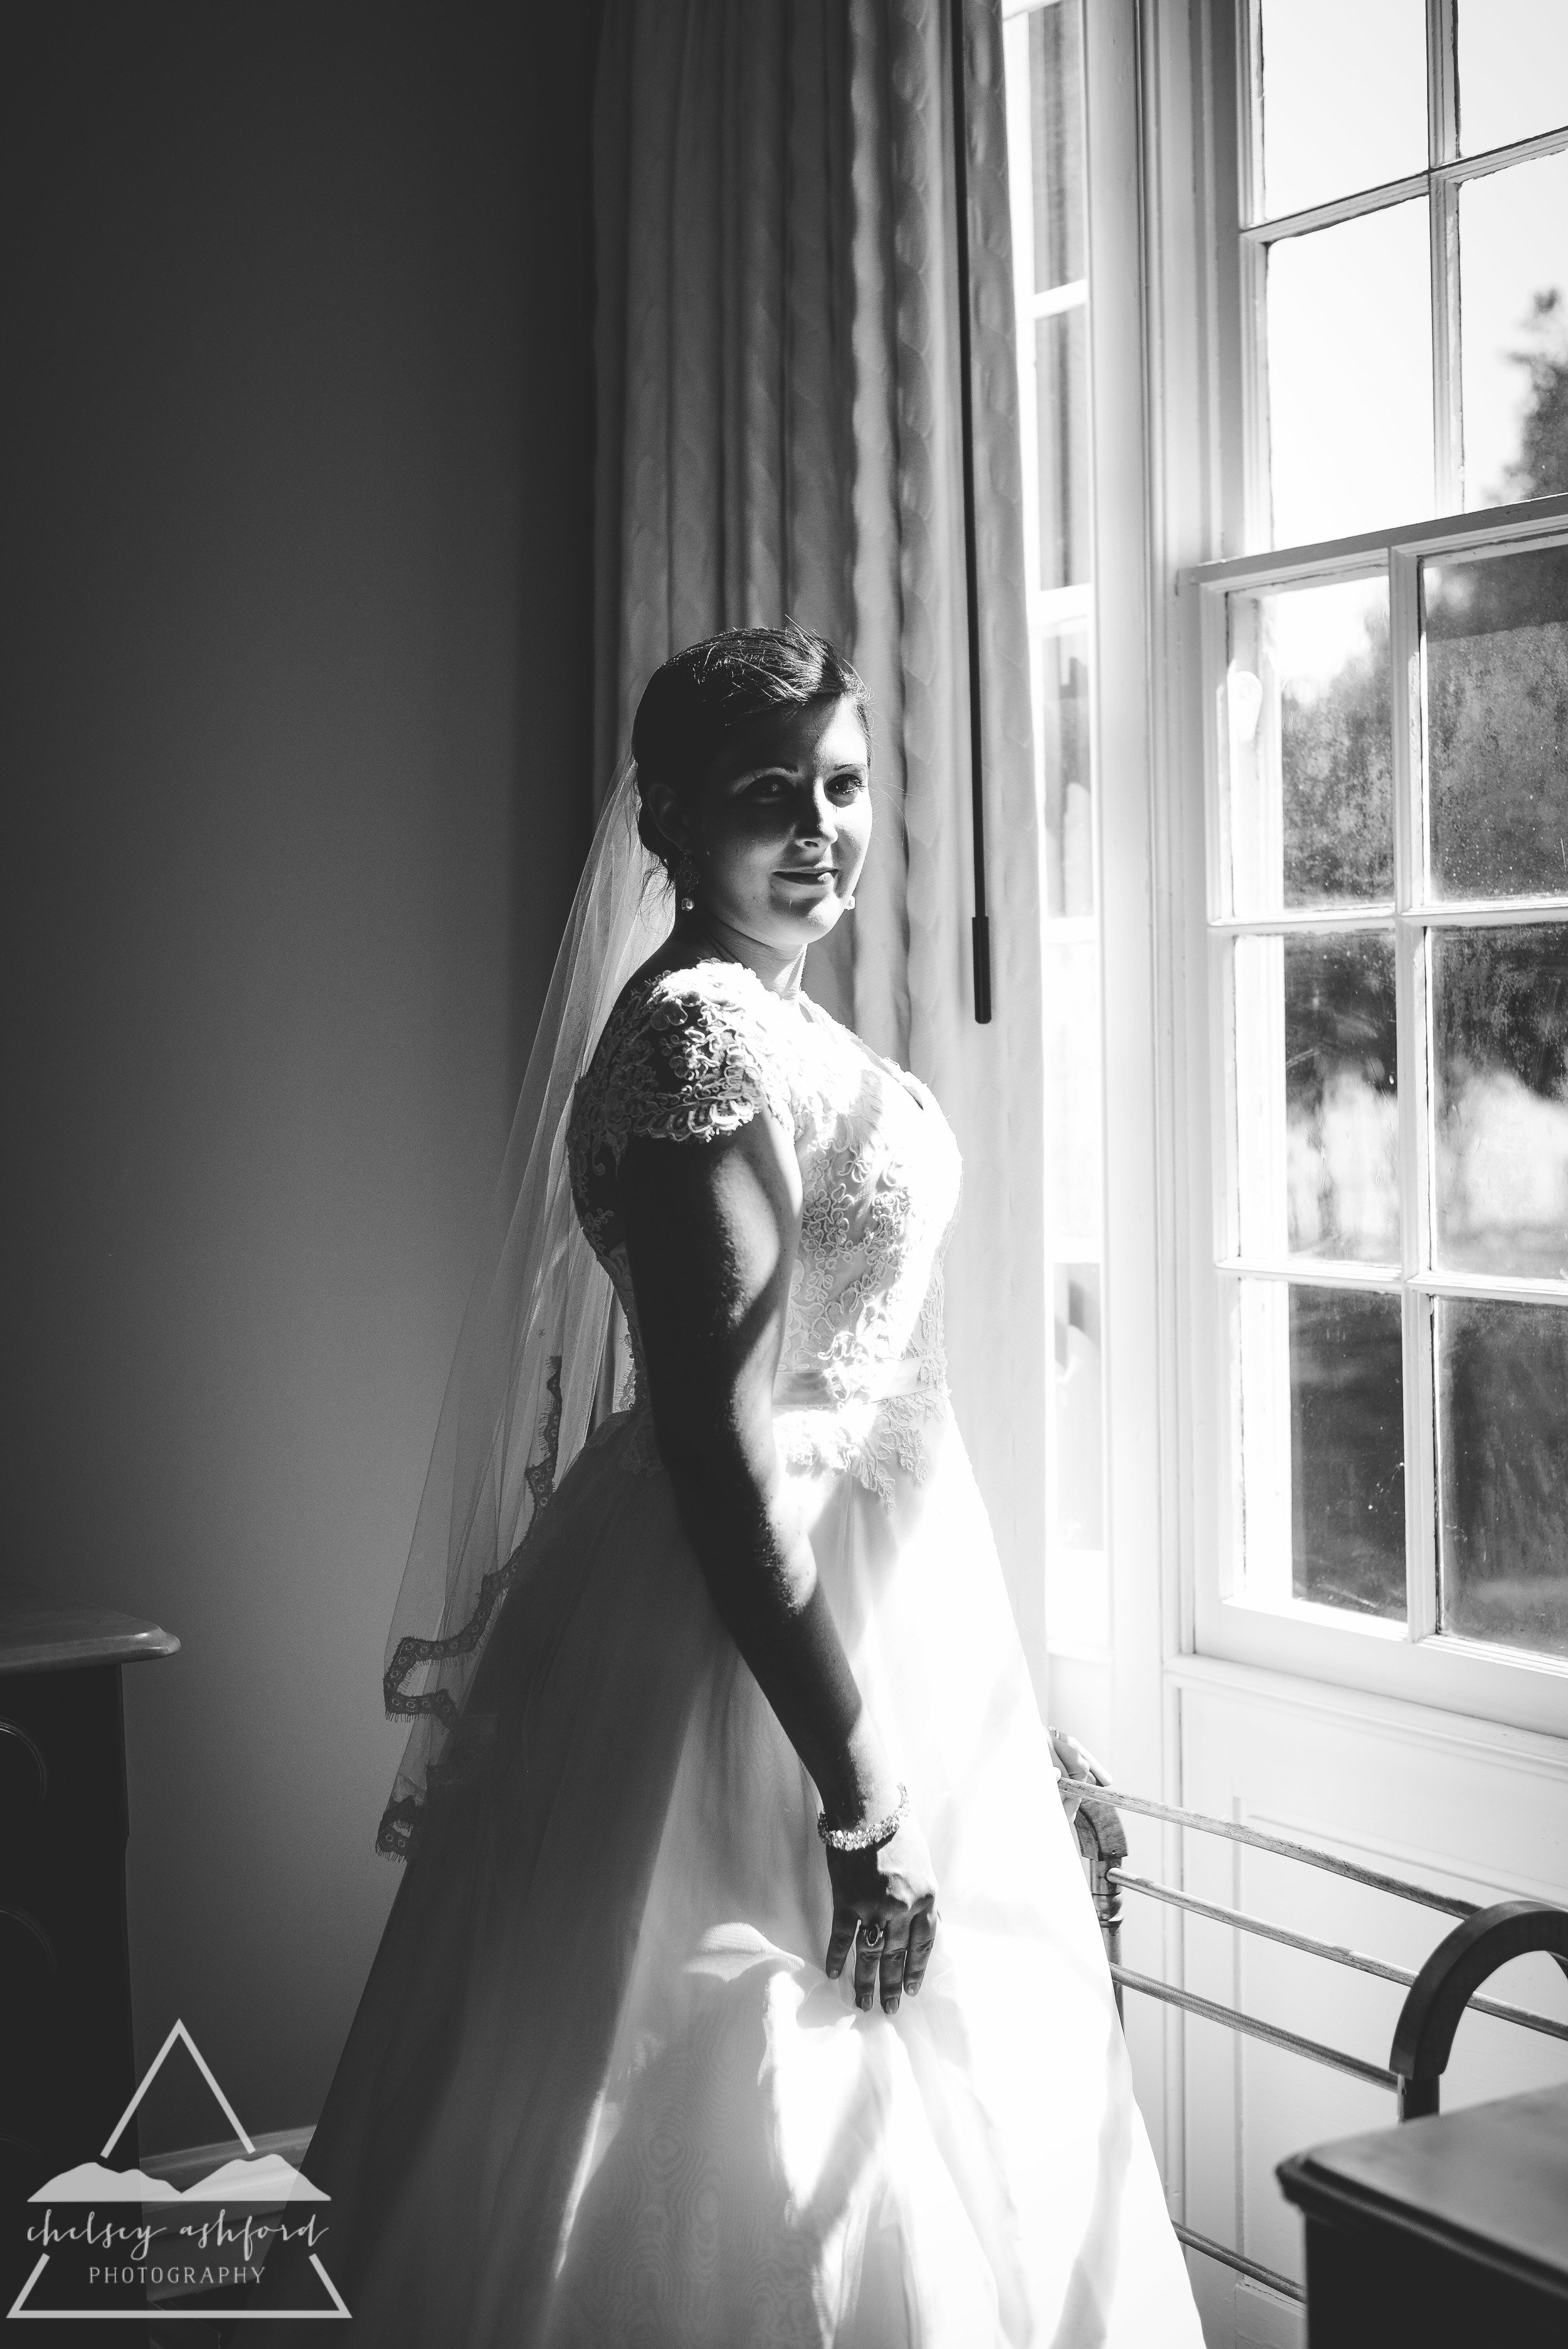 Clarkson_wedding_web-21.jpg